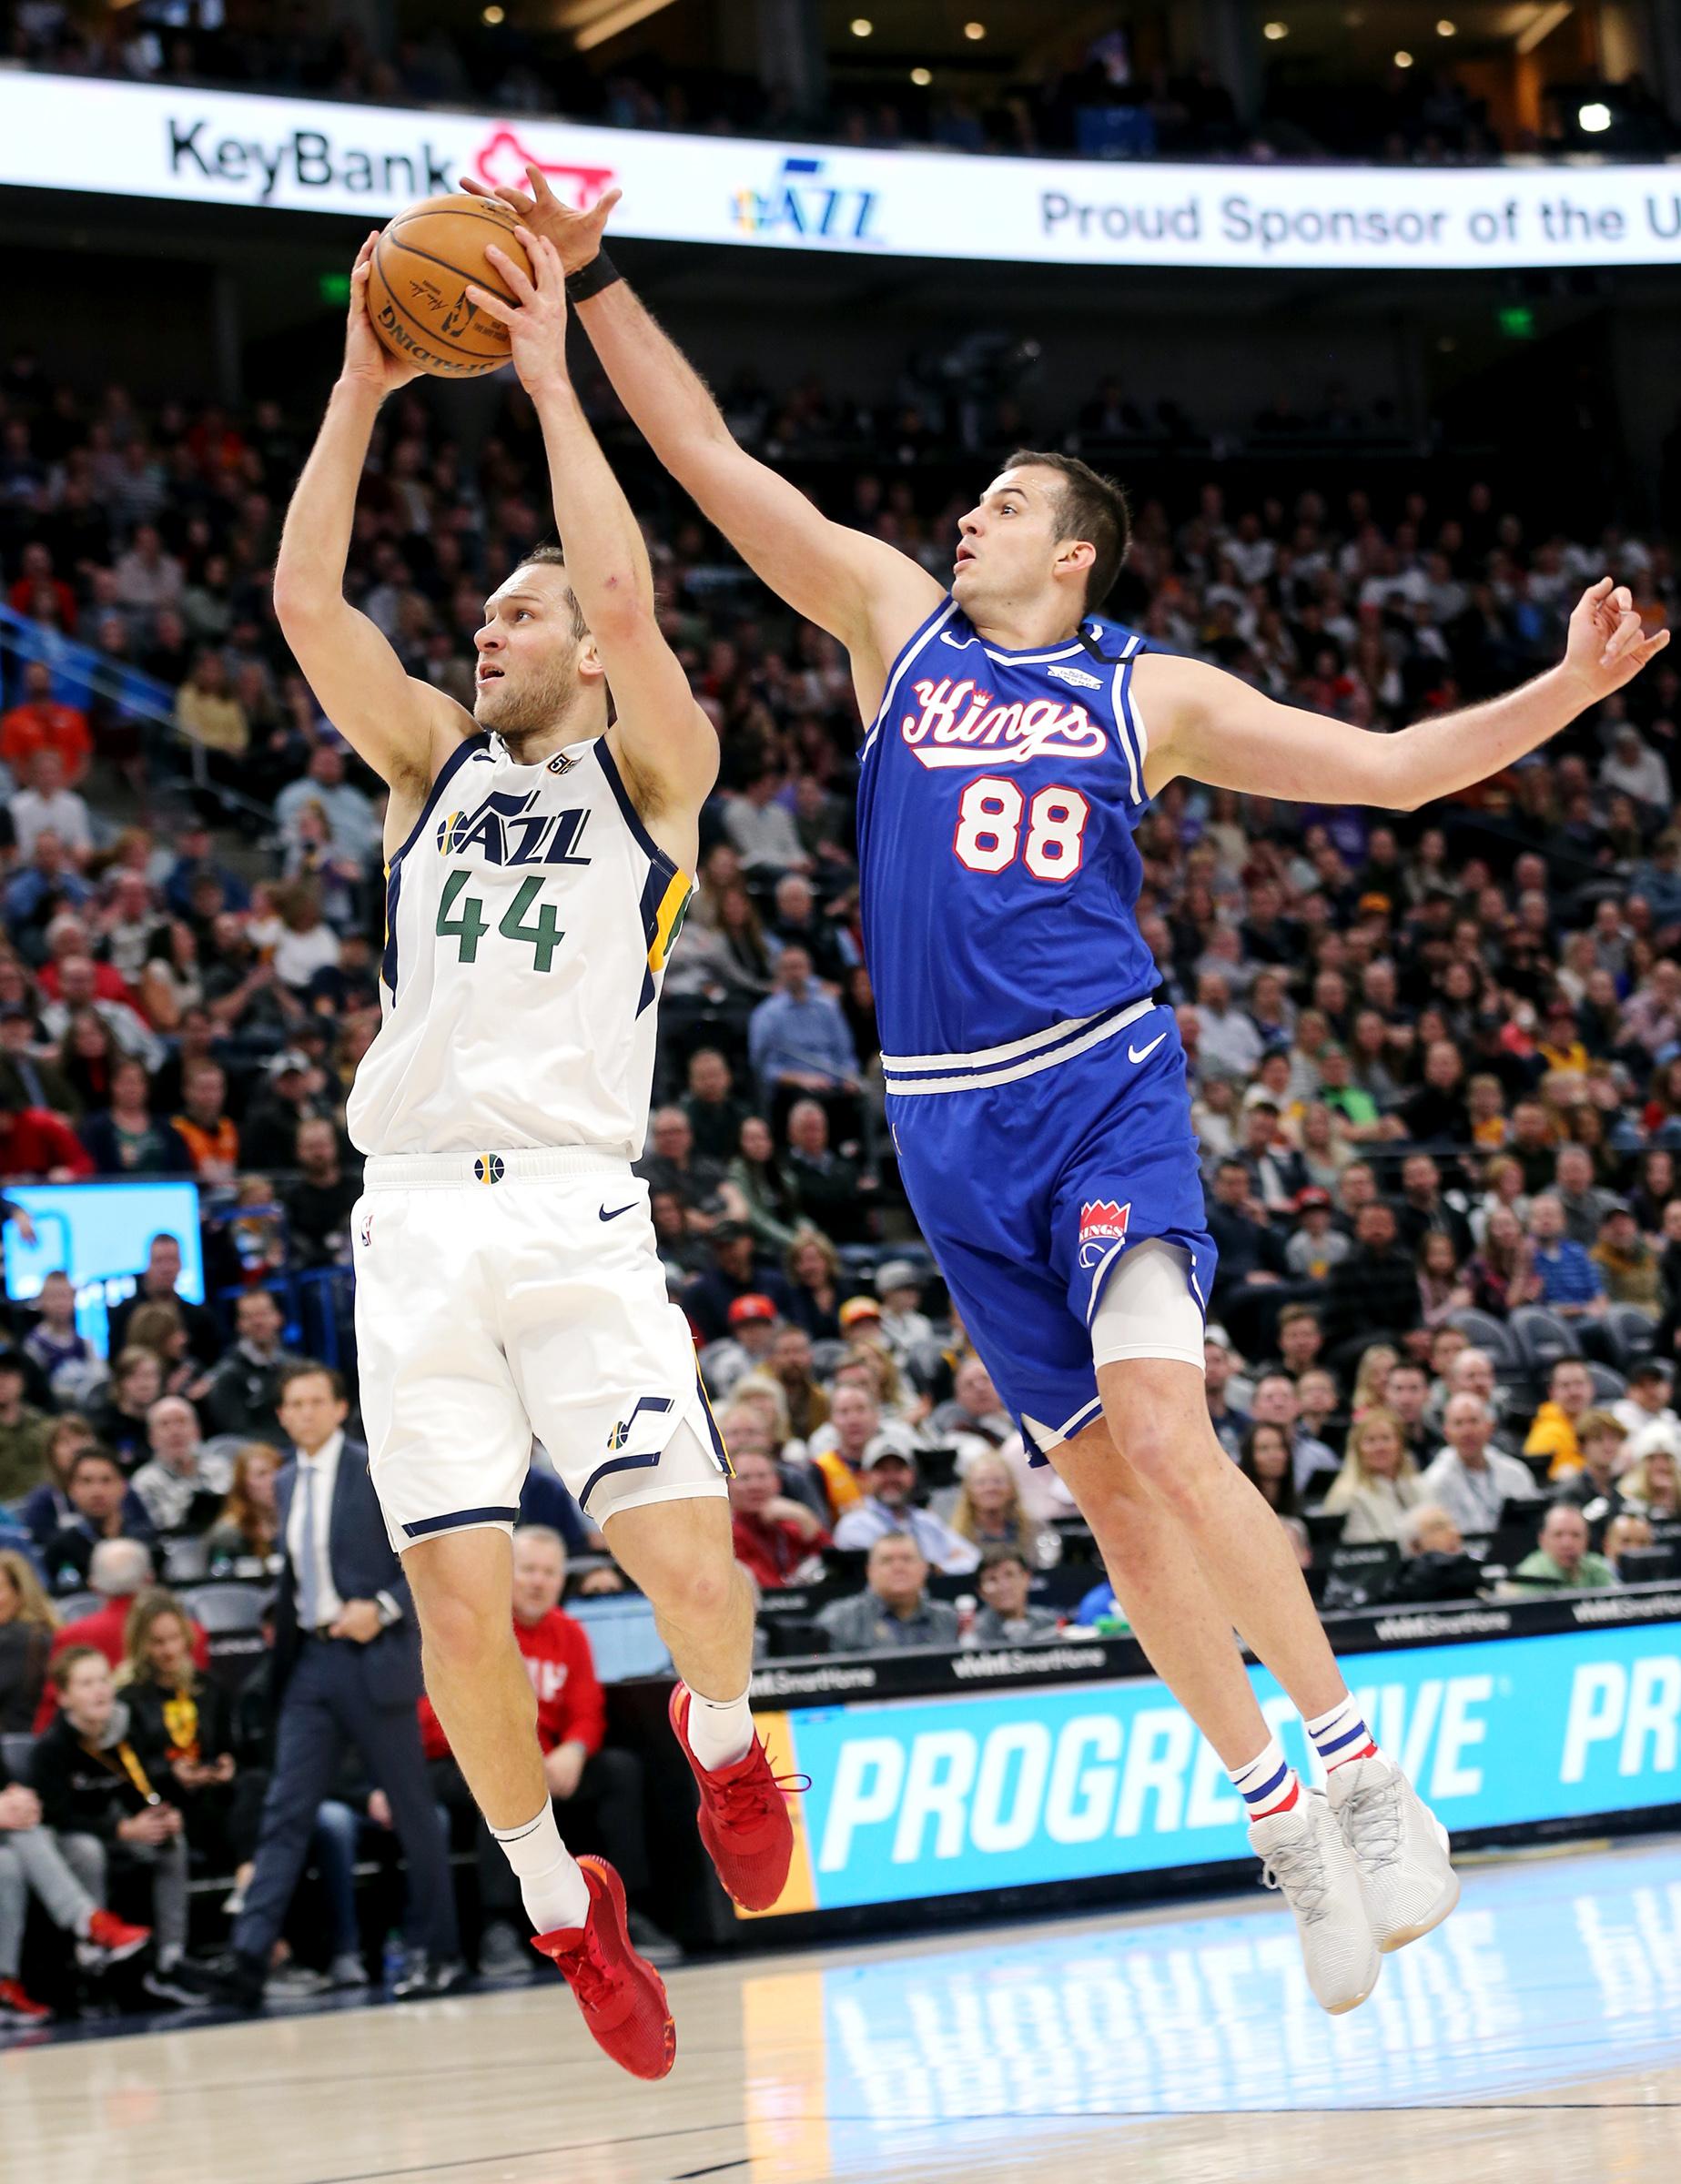 Utah Jazz forward Bojan Bogdanovic (44) goes up for a shot with Sacramento Kings forward Nemanja Bjelica (88) defending as the Utah Jazz and the Sacramento Kings play an NBA basketball game at Vivint Smart Home Arena in Salt Lake City on Saturday, Jan. 18, 2020.